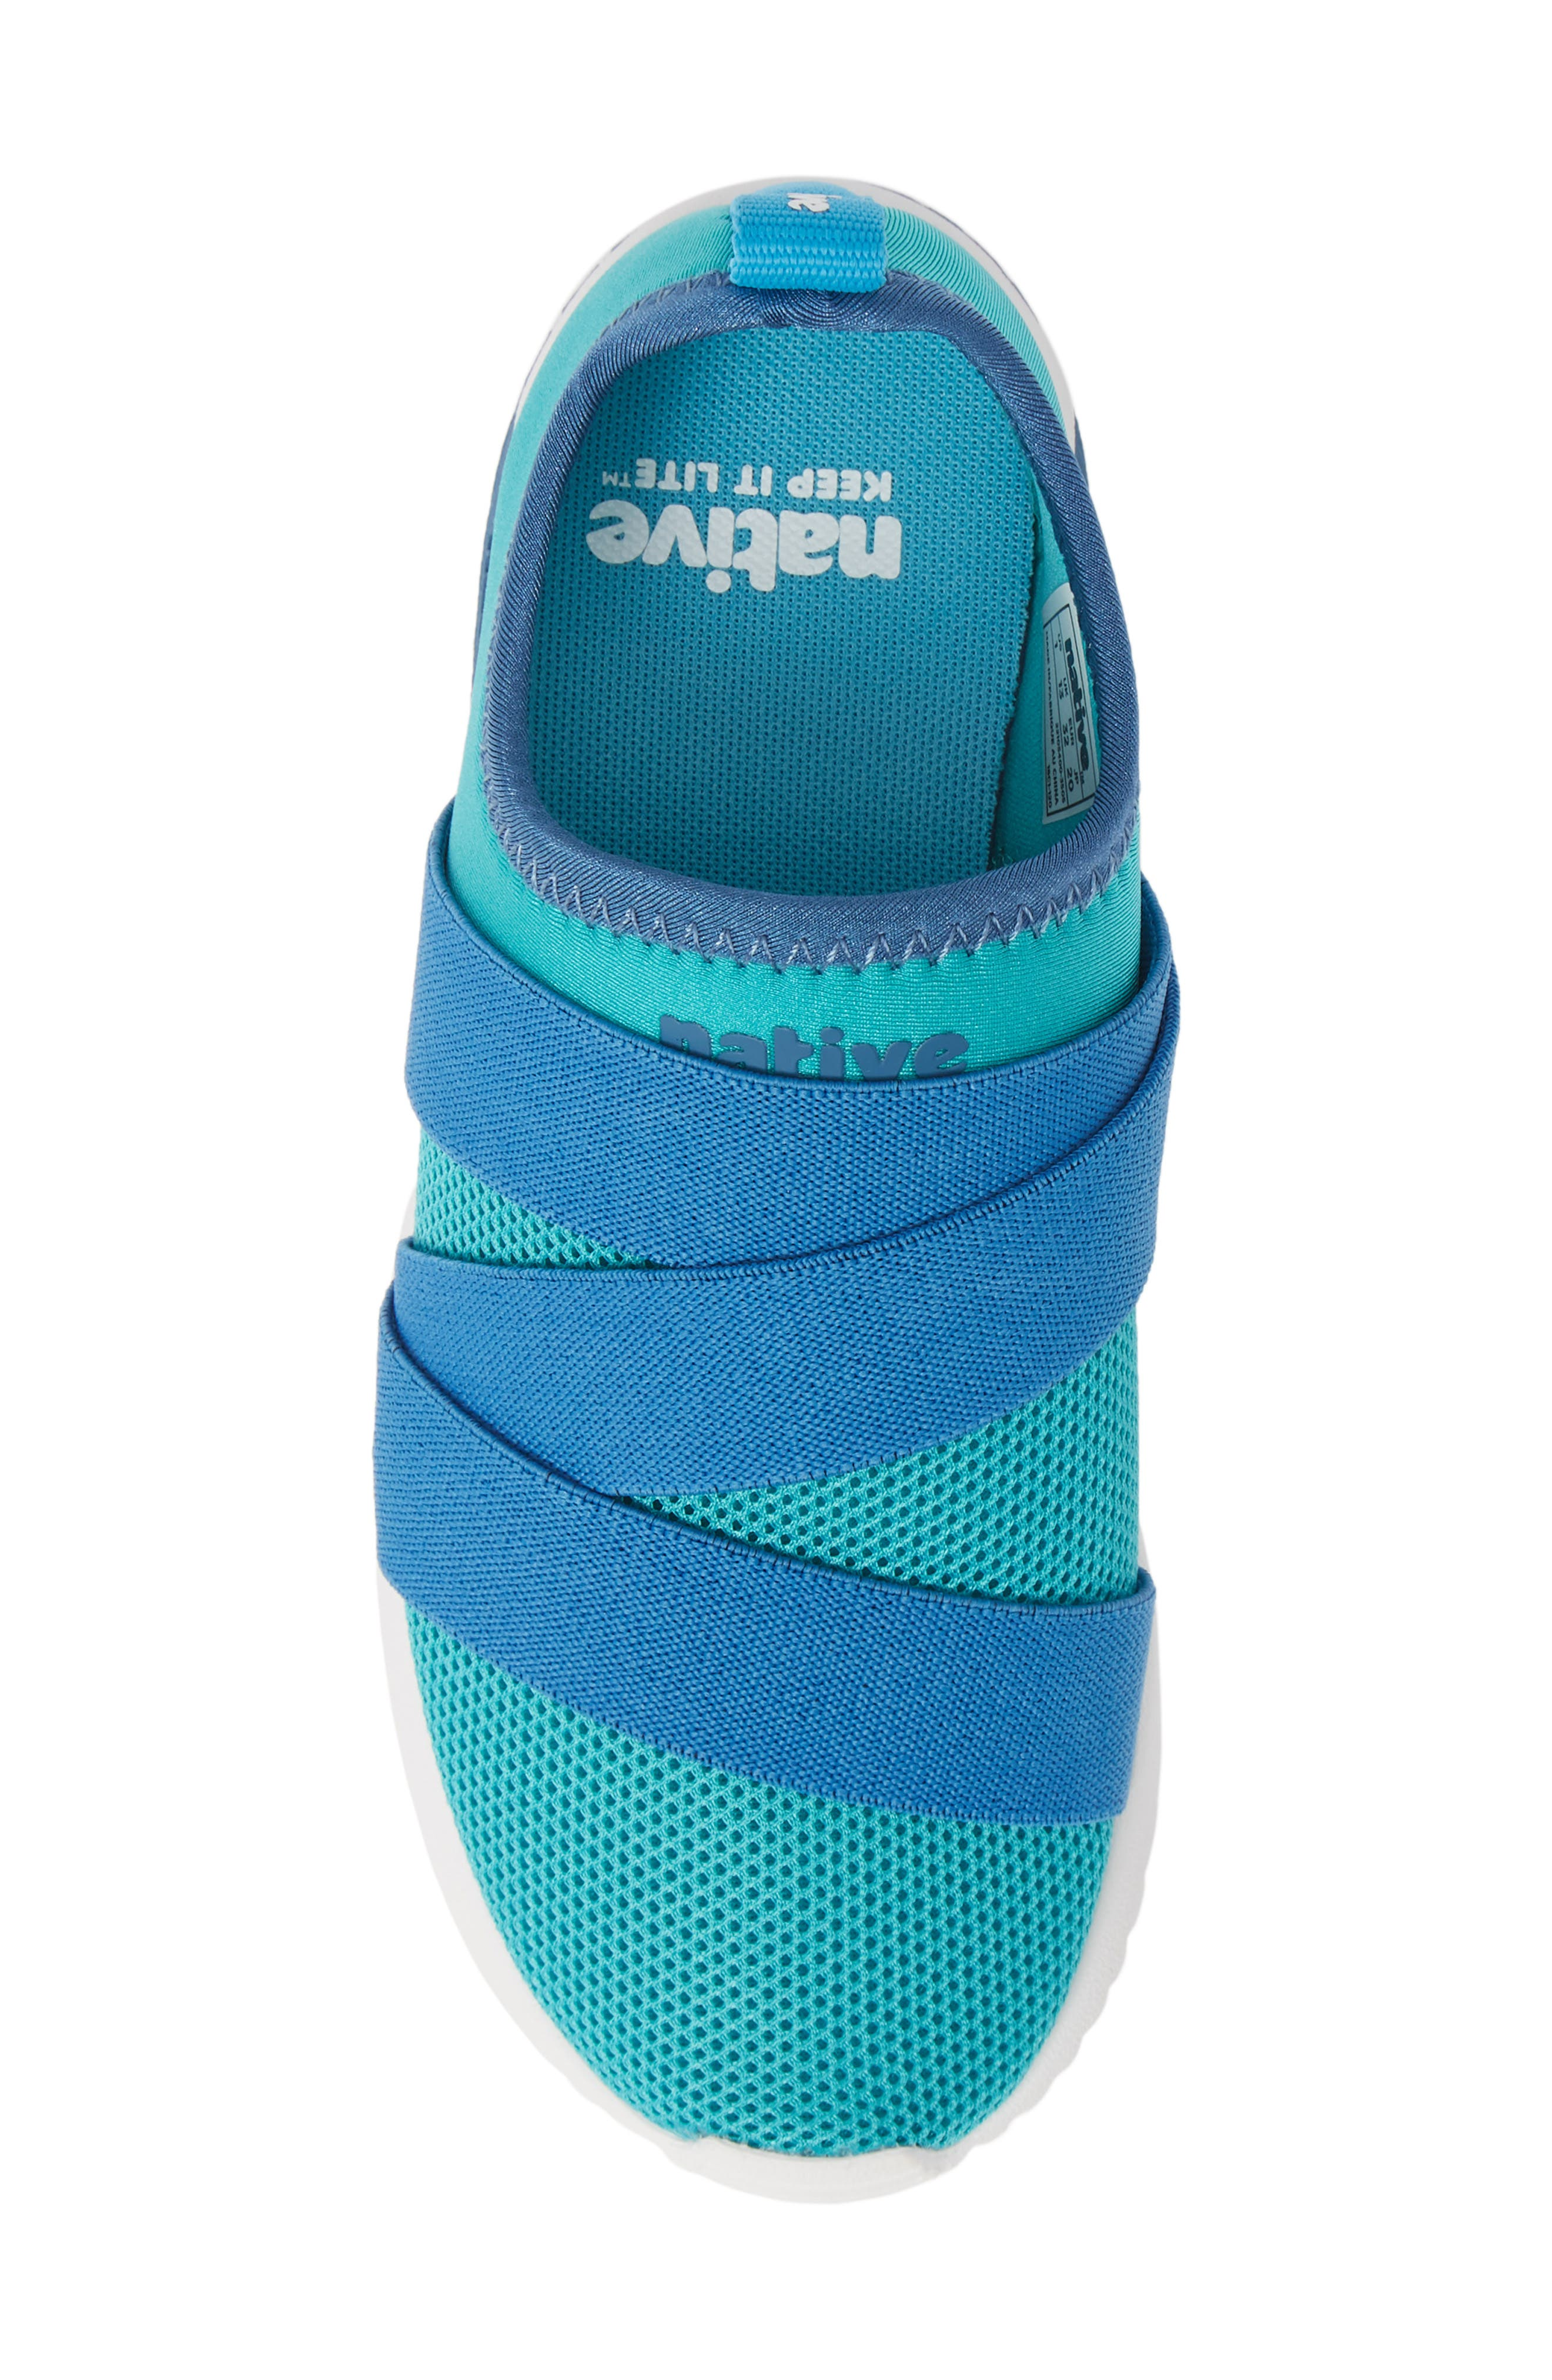 NATIVE SHOES,                             Phoenix Slip-On Vegan Sneaker,                             Alternate thumbnail 5, color,                             GLACIER GREEN/ BLUE/ WHITE